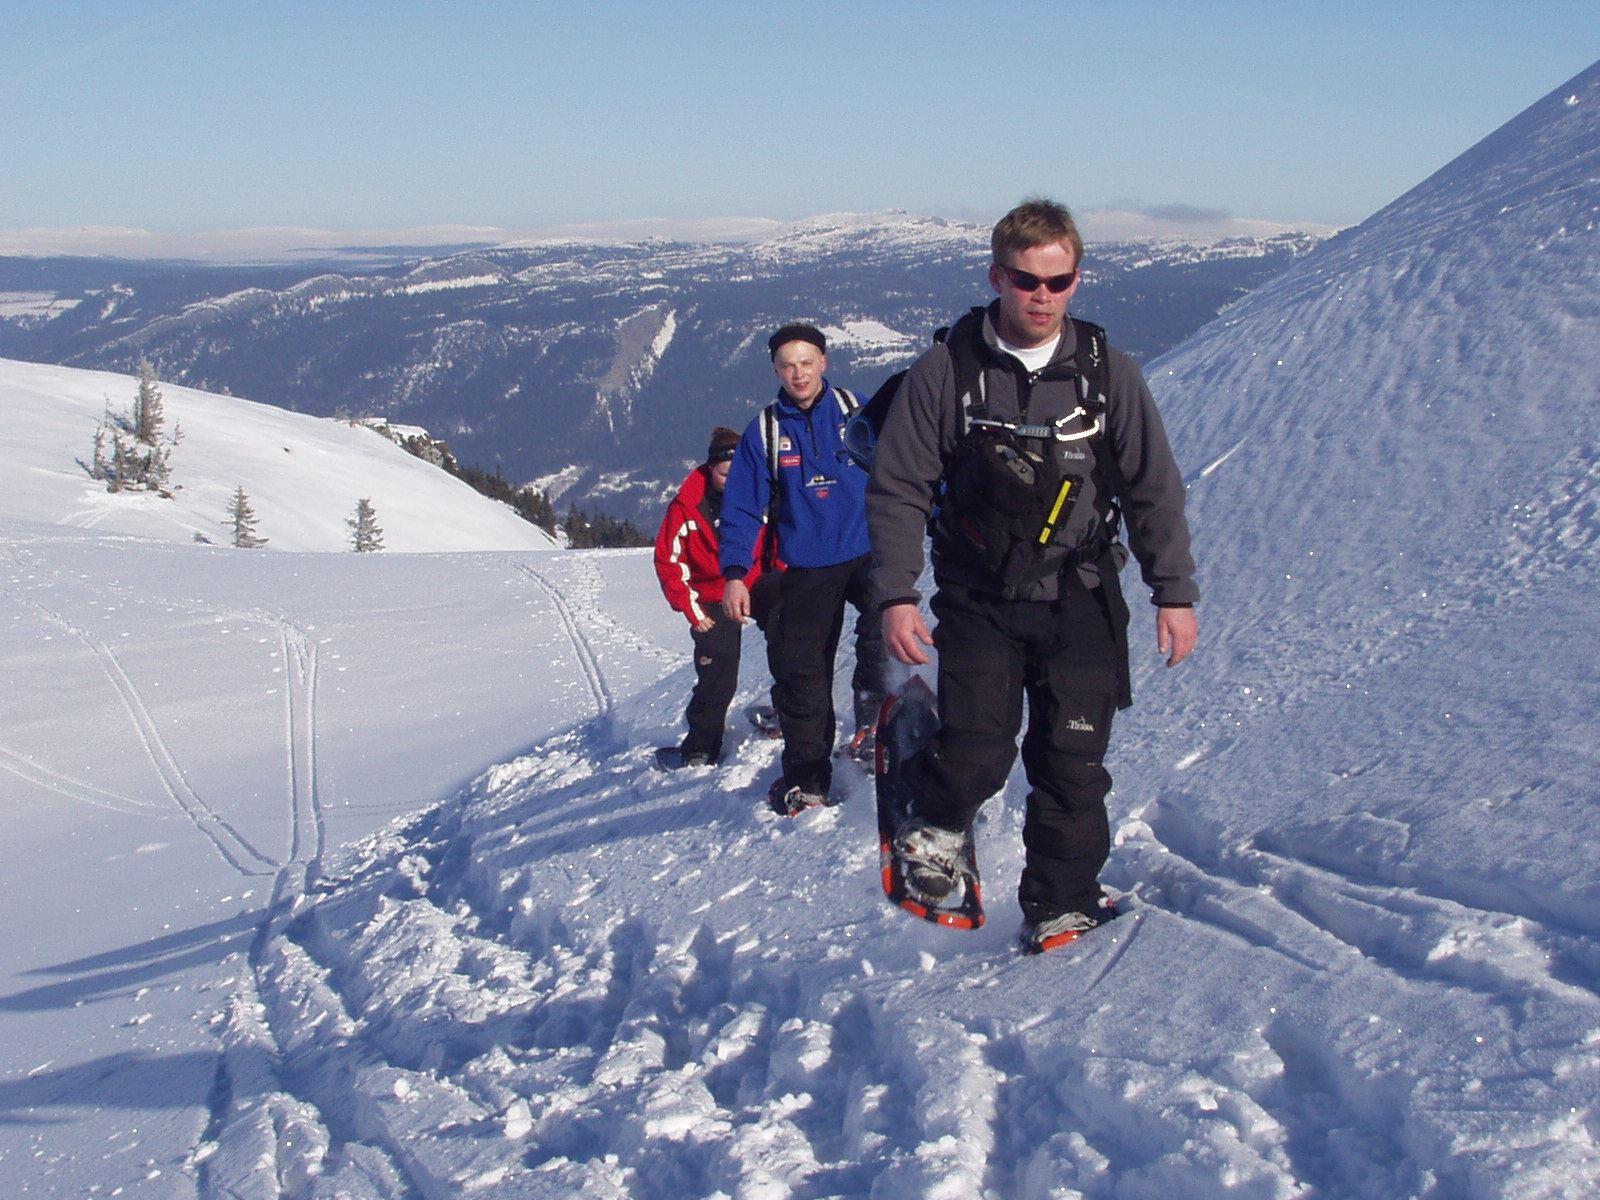 © Hafjell Resort, Guidet trugetur i Hafjell